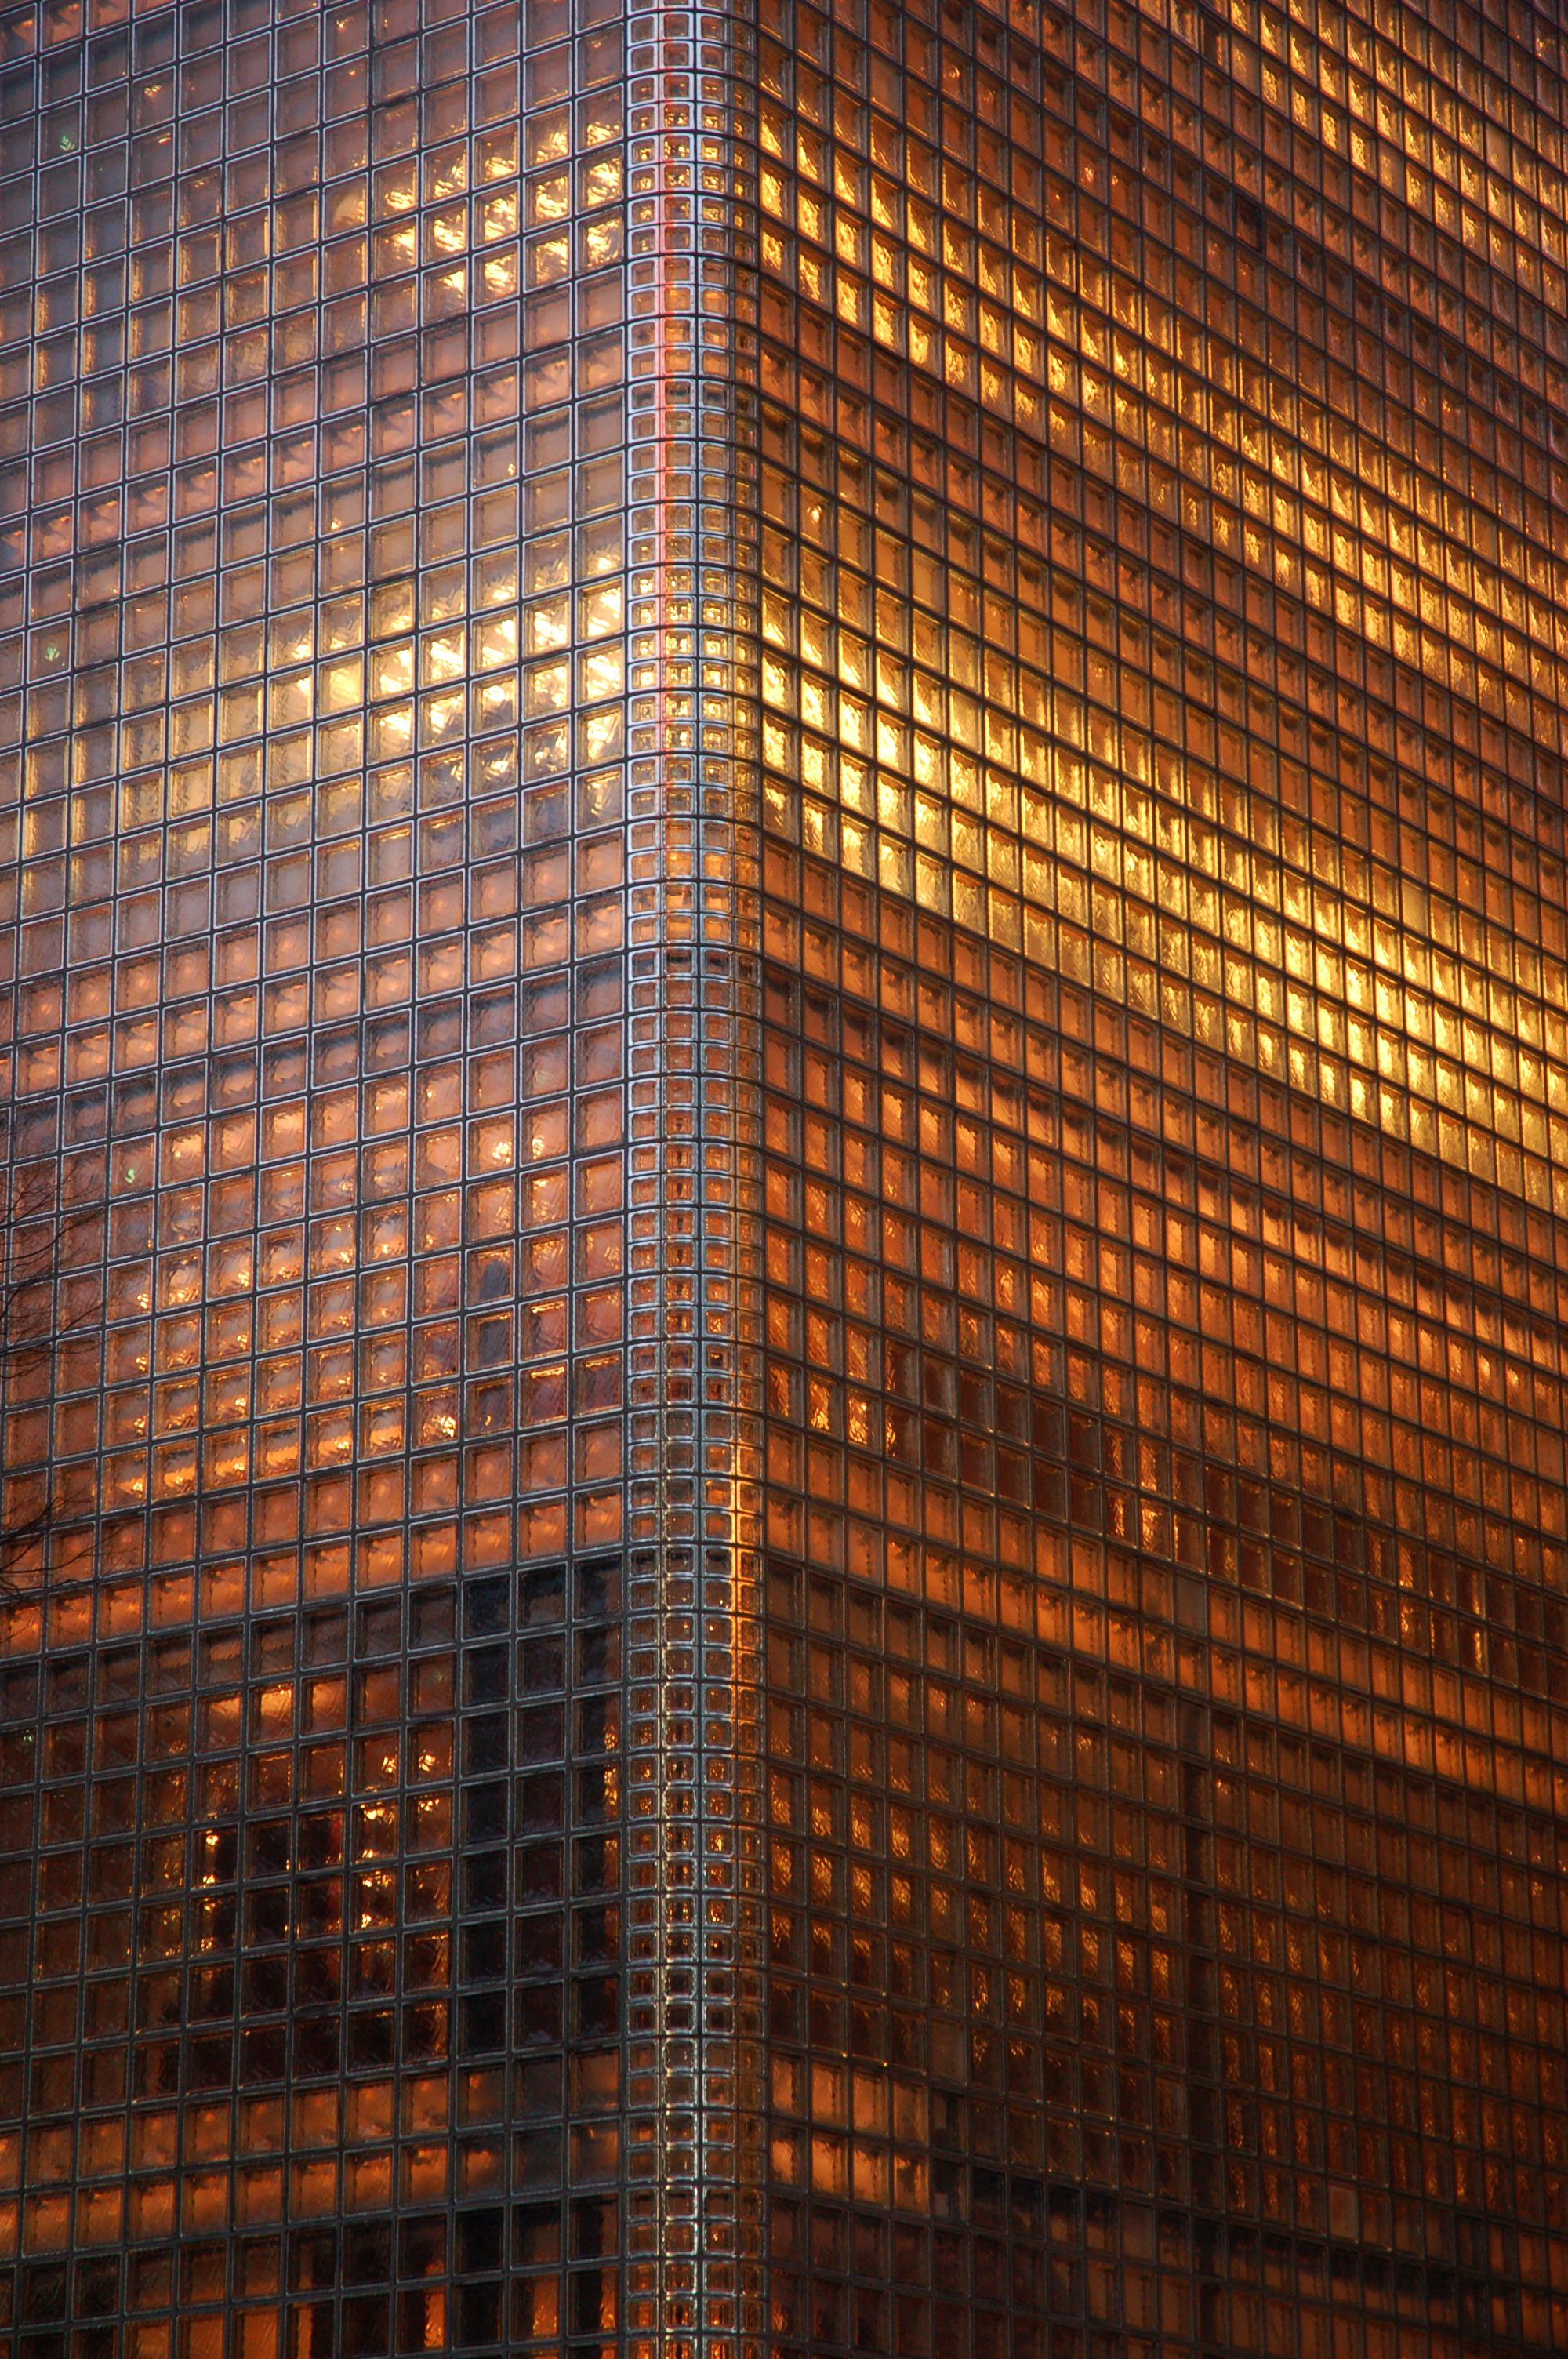 Maison Hermes By Renzo Piano 5 4 19 Ginza Chuo Ku